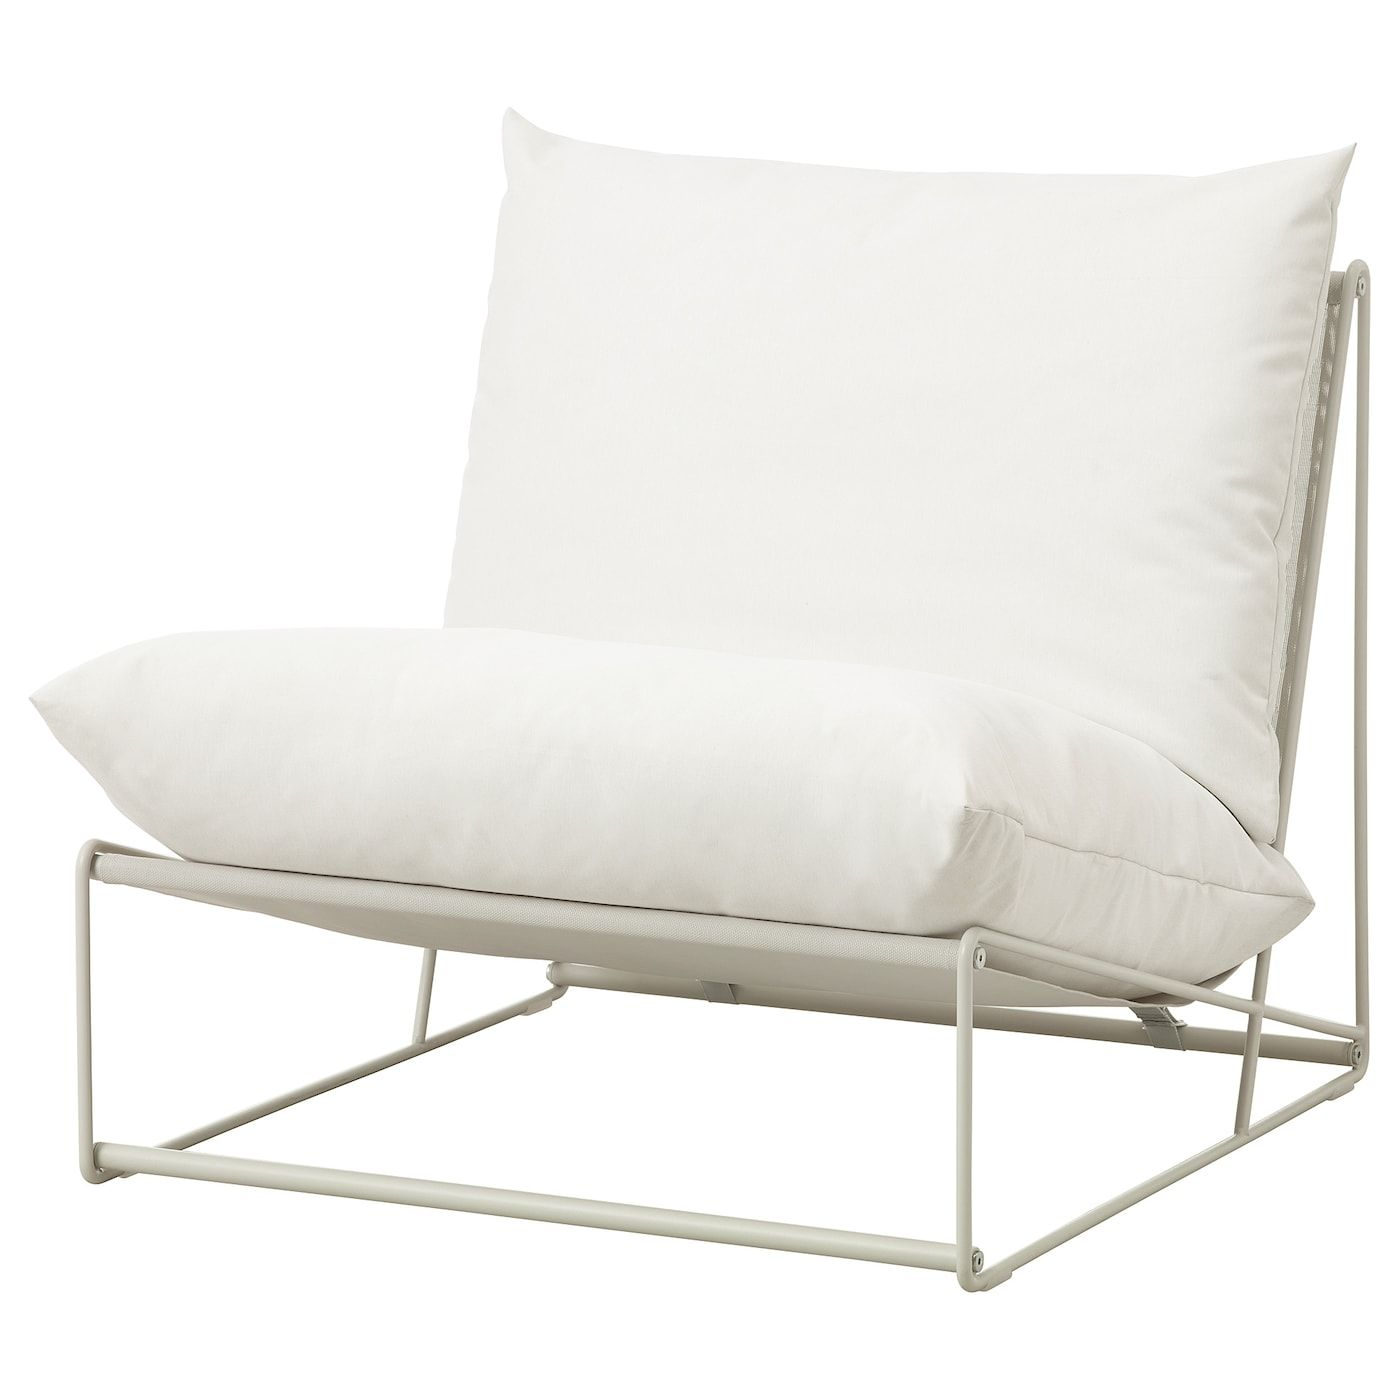 Havsten Chair In Outdoor Beige Ikea Furniture Cushions On